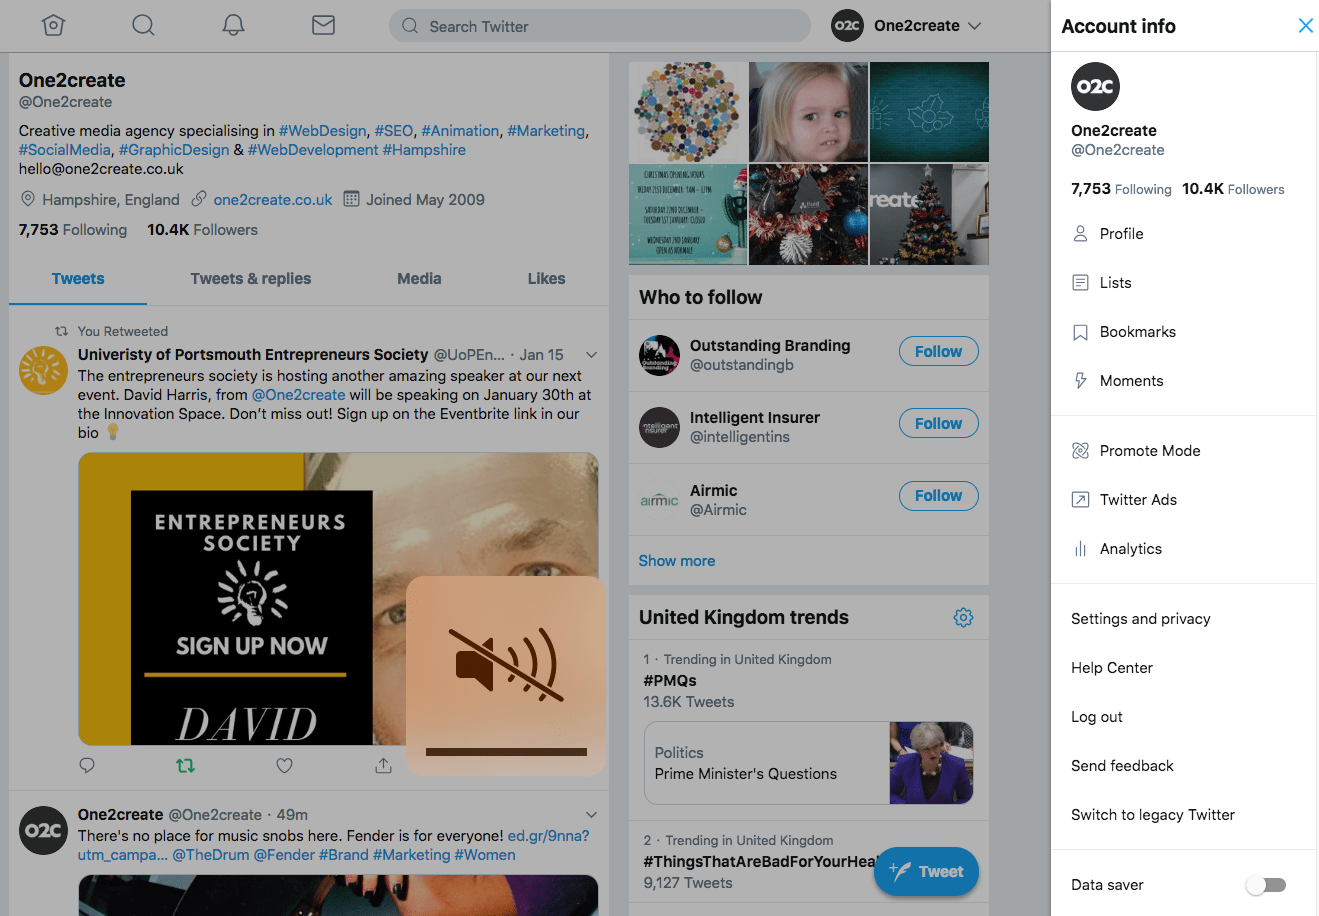 Twitter releases sneak peek of new layout| Blog | One2create